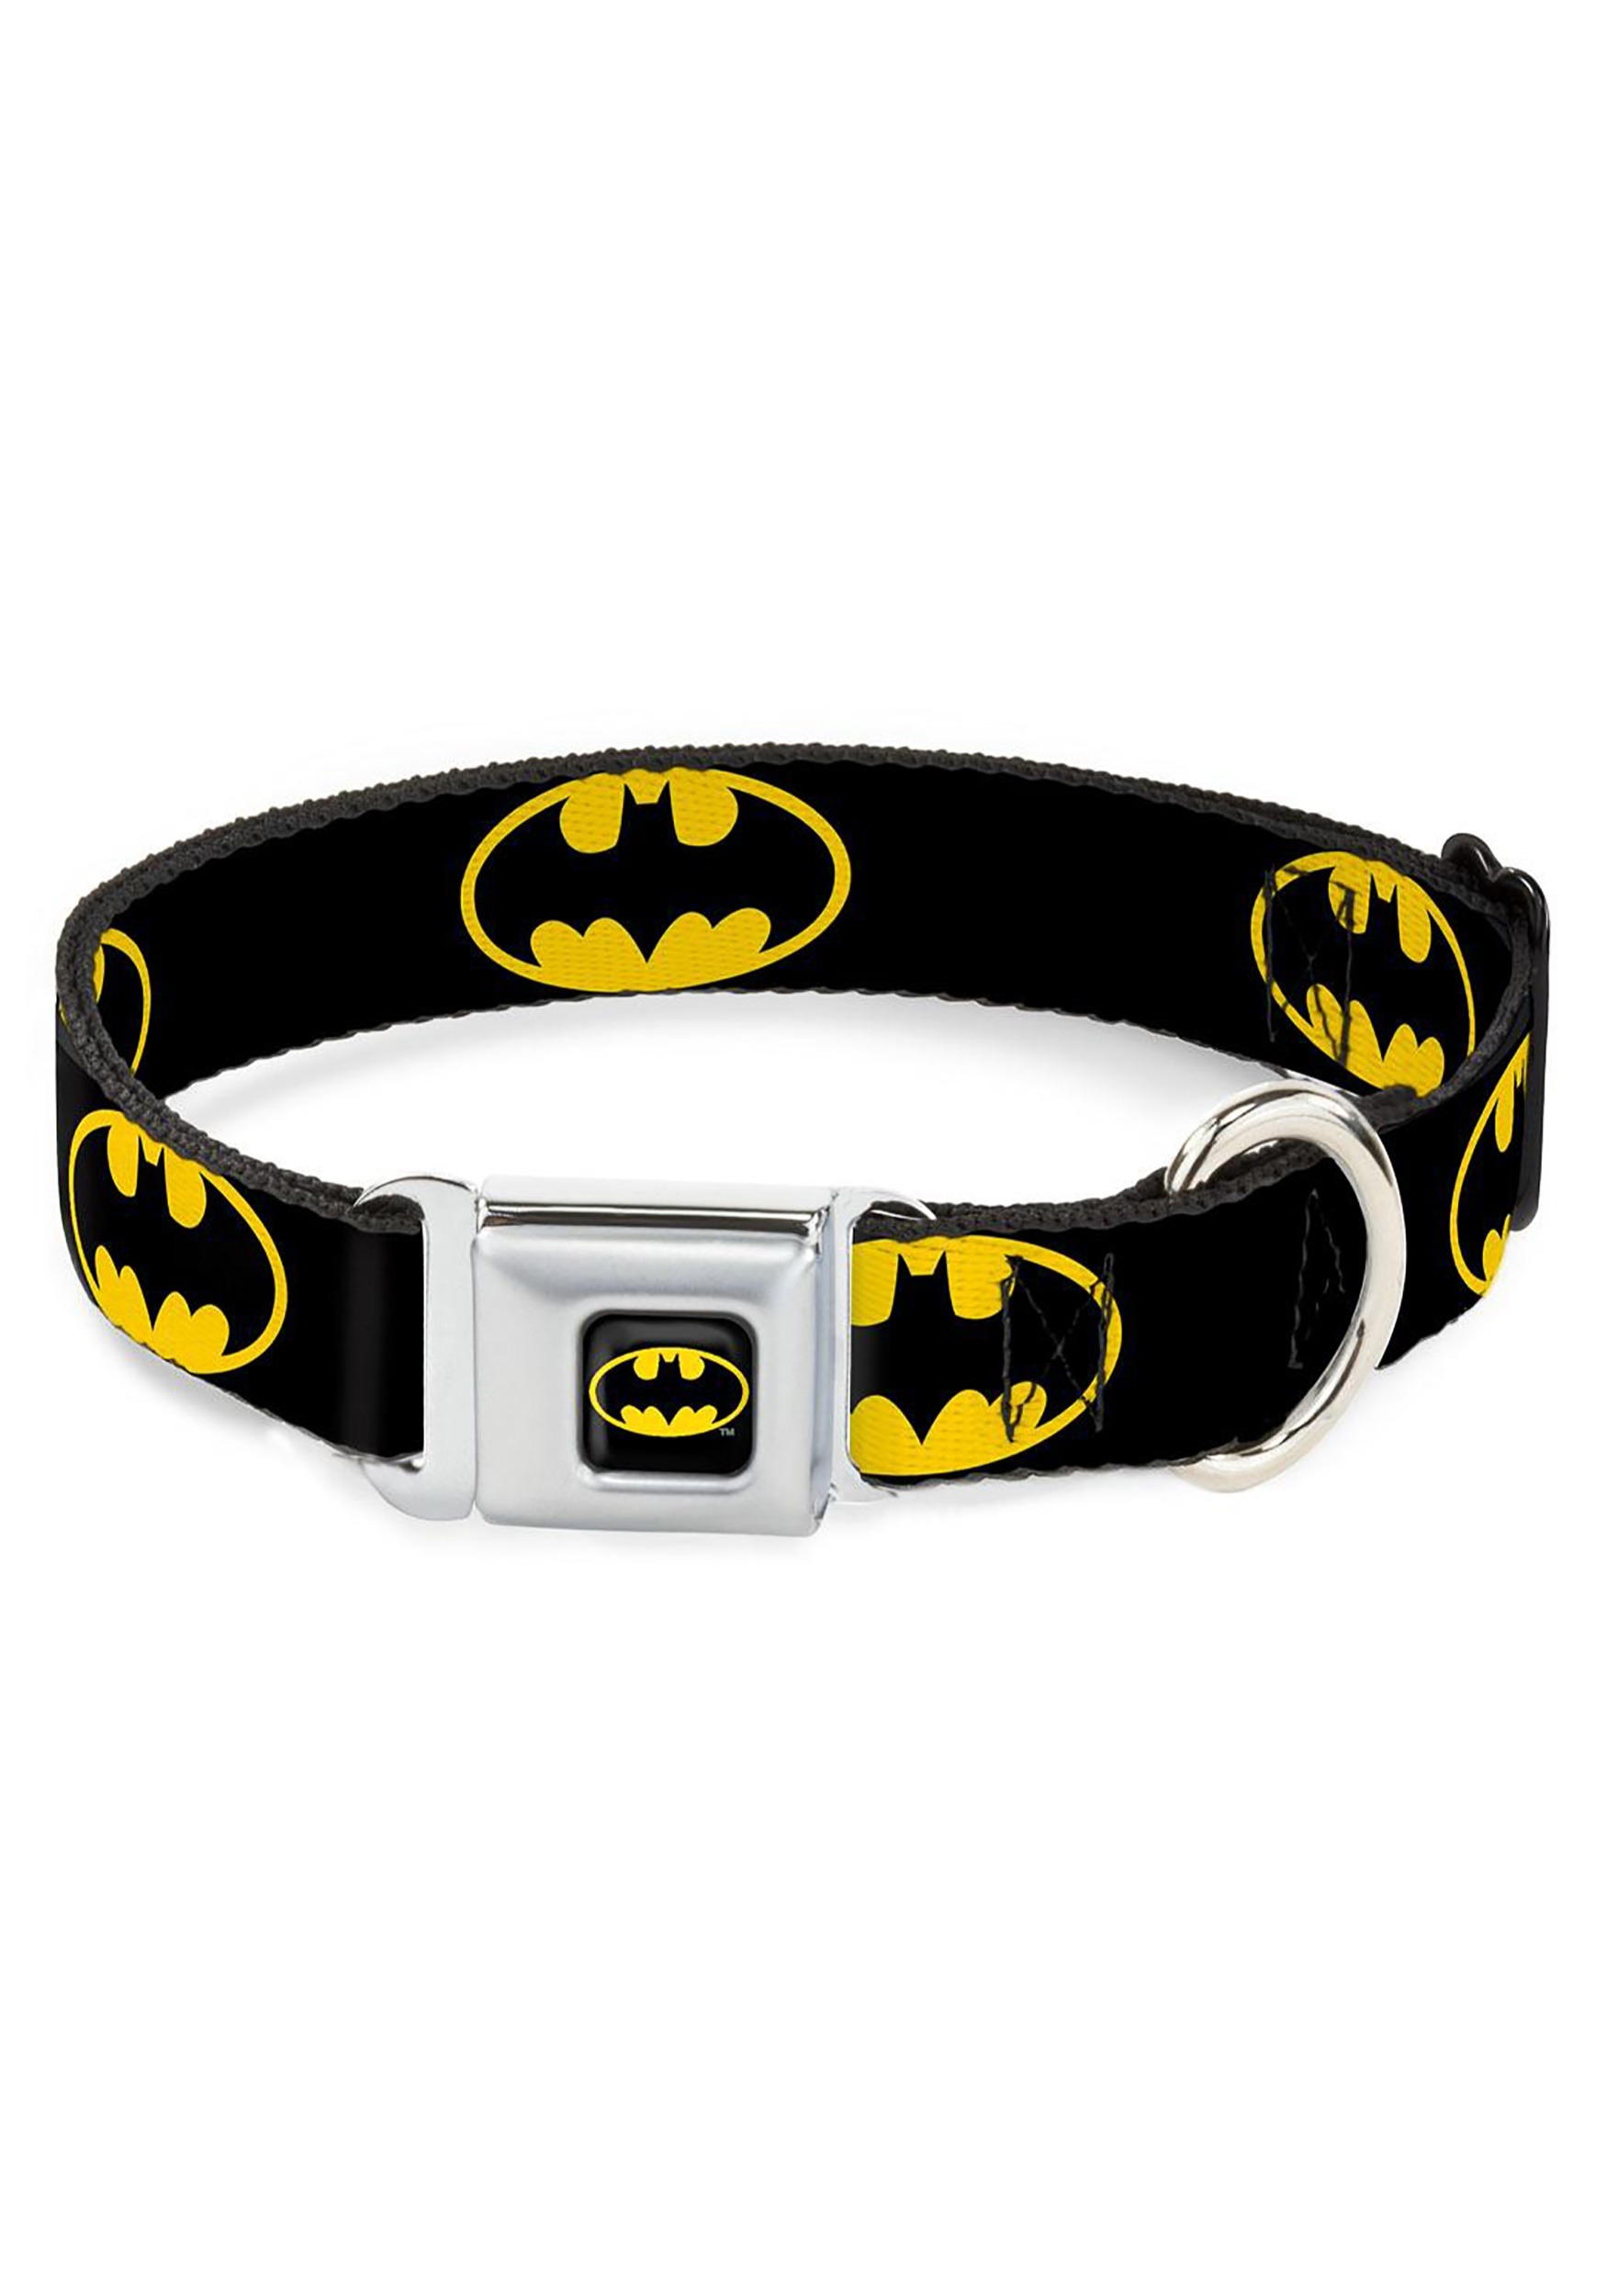 Batman Logo Black Seatbelt Buckle Dog Collar- 1